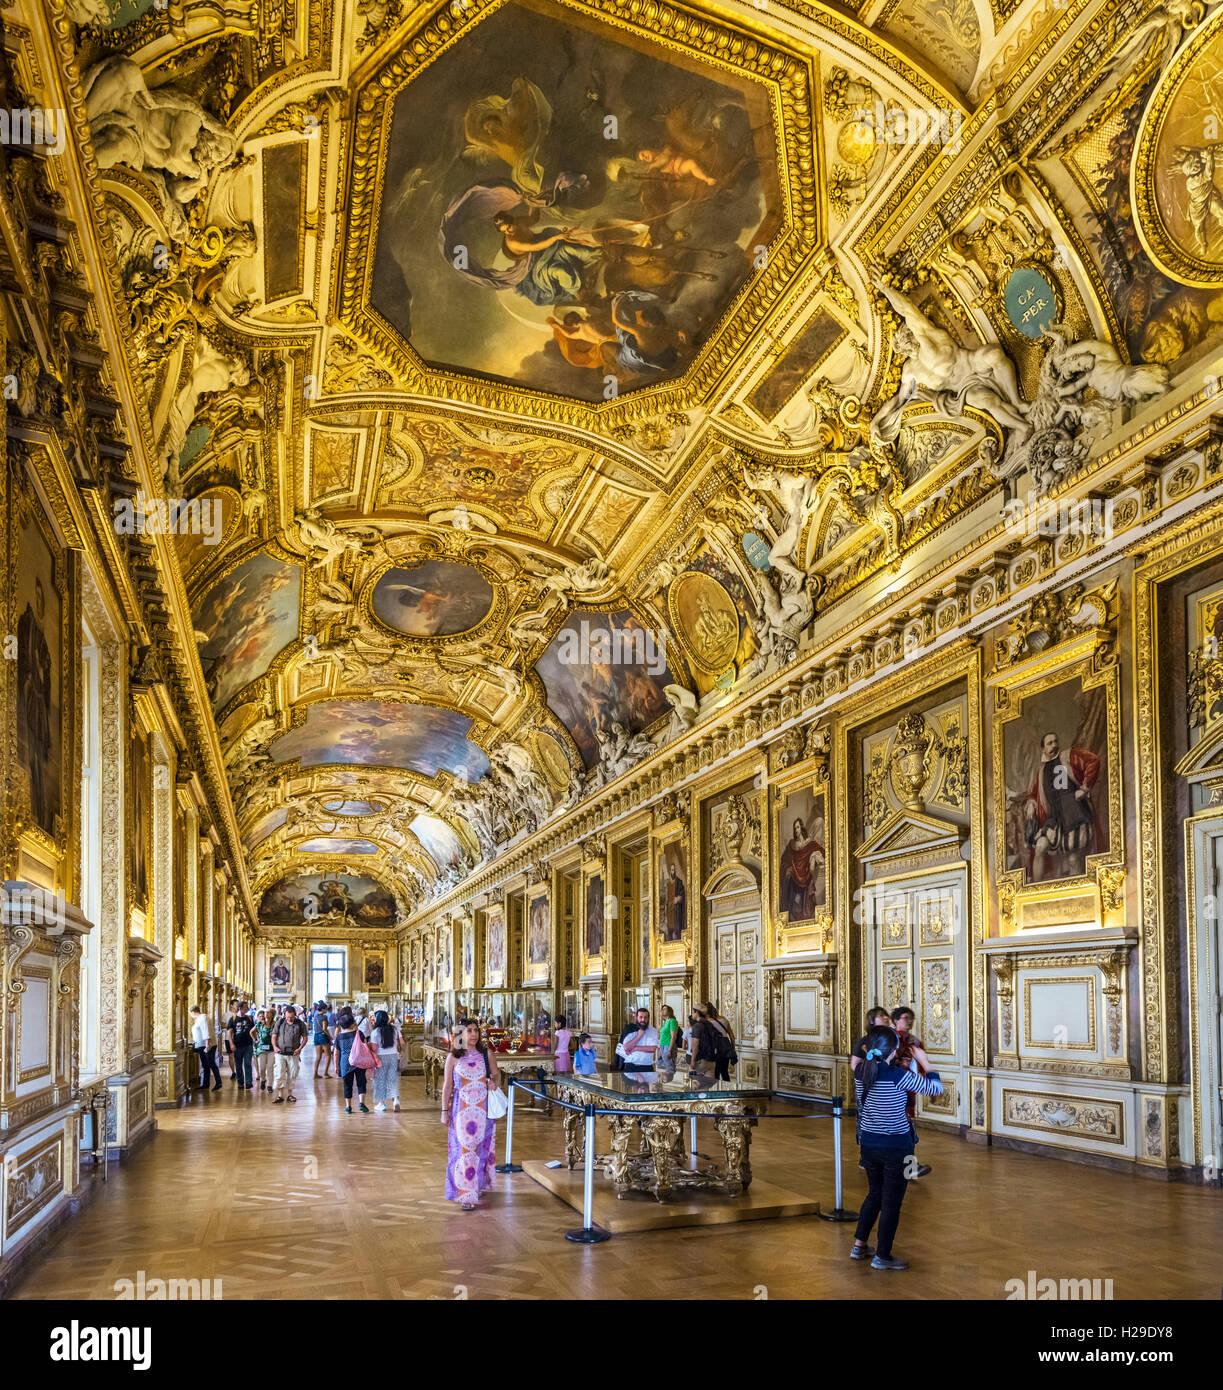 Louvre interior. La Galerie d'Apollon (Apollo Gallery), designed in 1661 by Louis Le Vau and Charles Le Brun - Stock Image